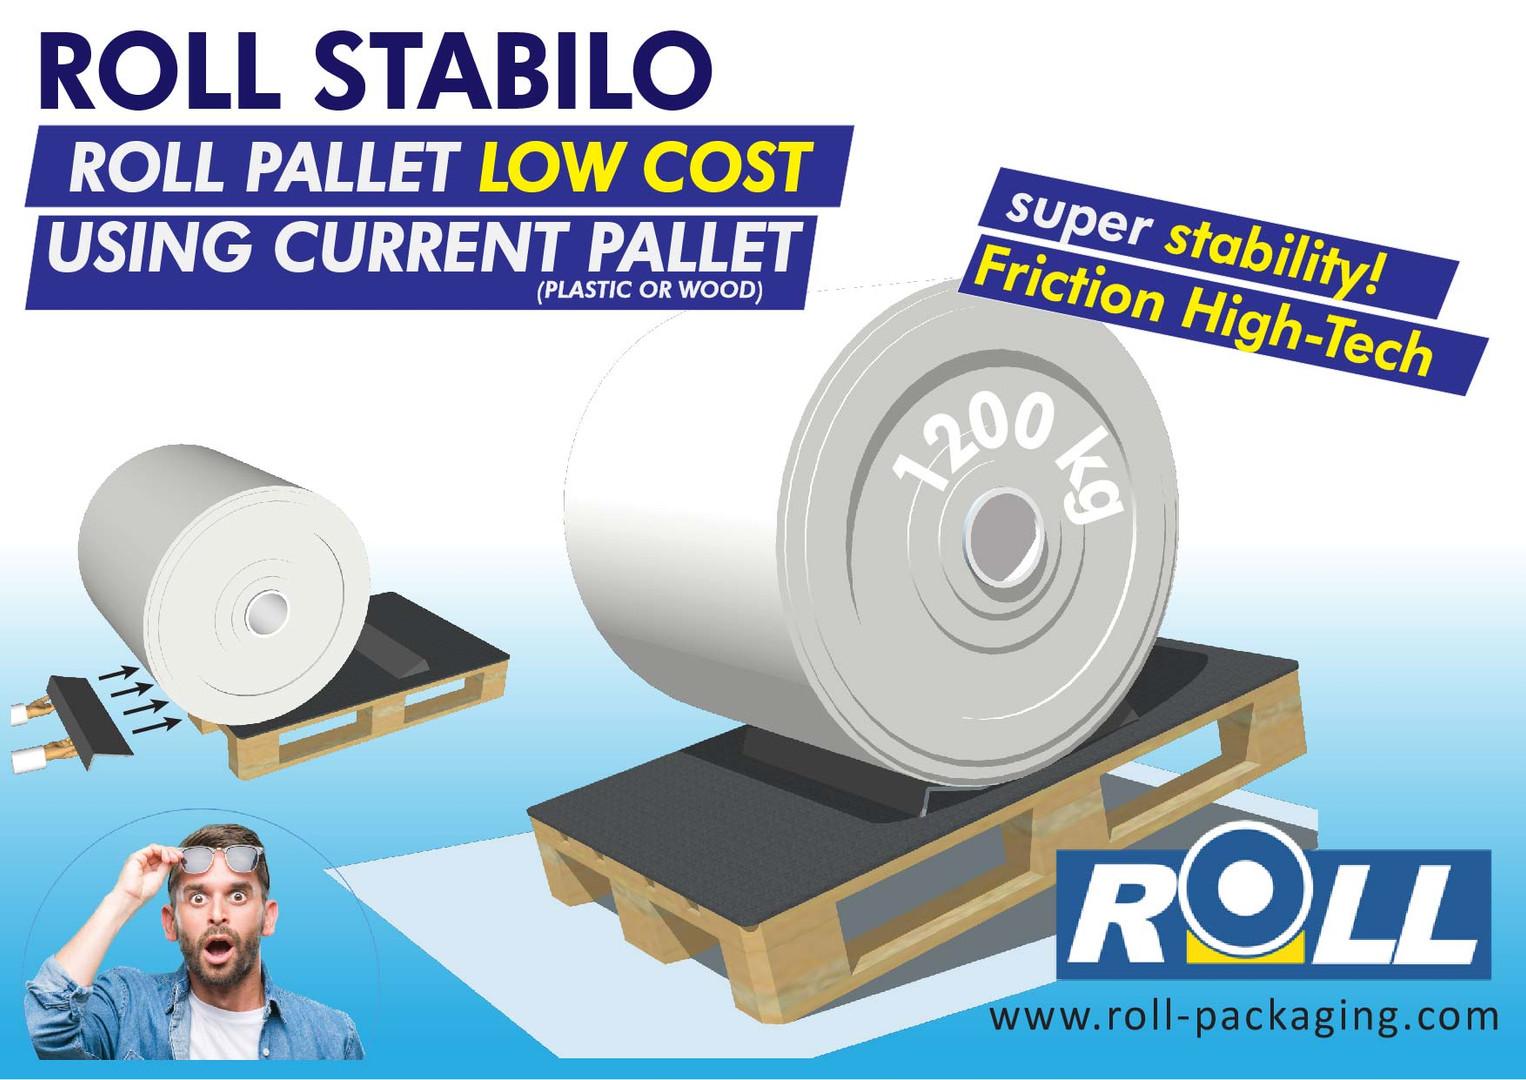 Campagna ROLL PALLET STABILO - ITA.jpg